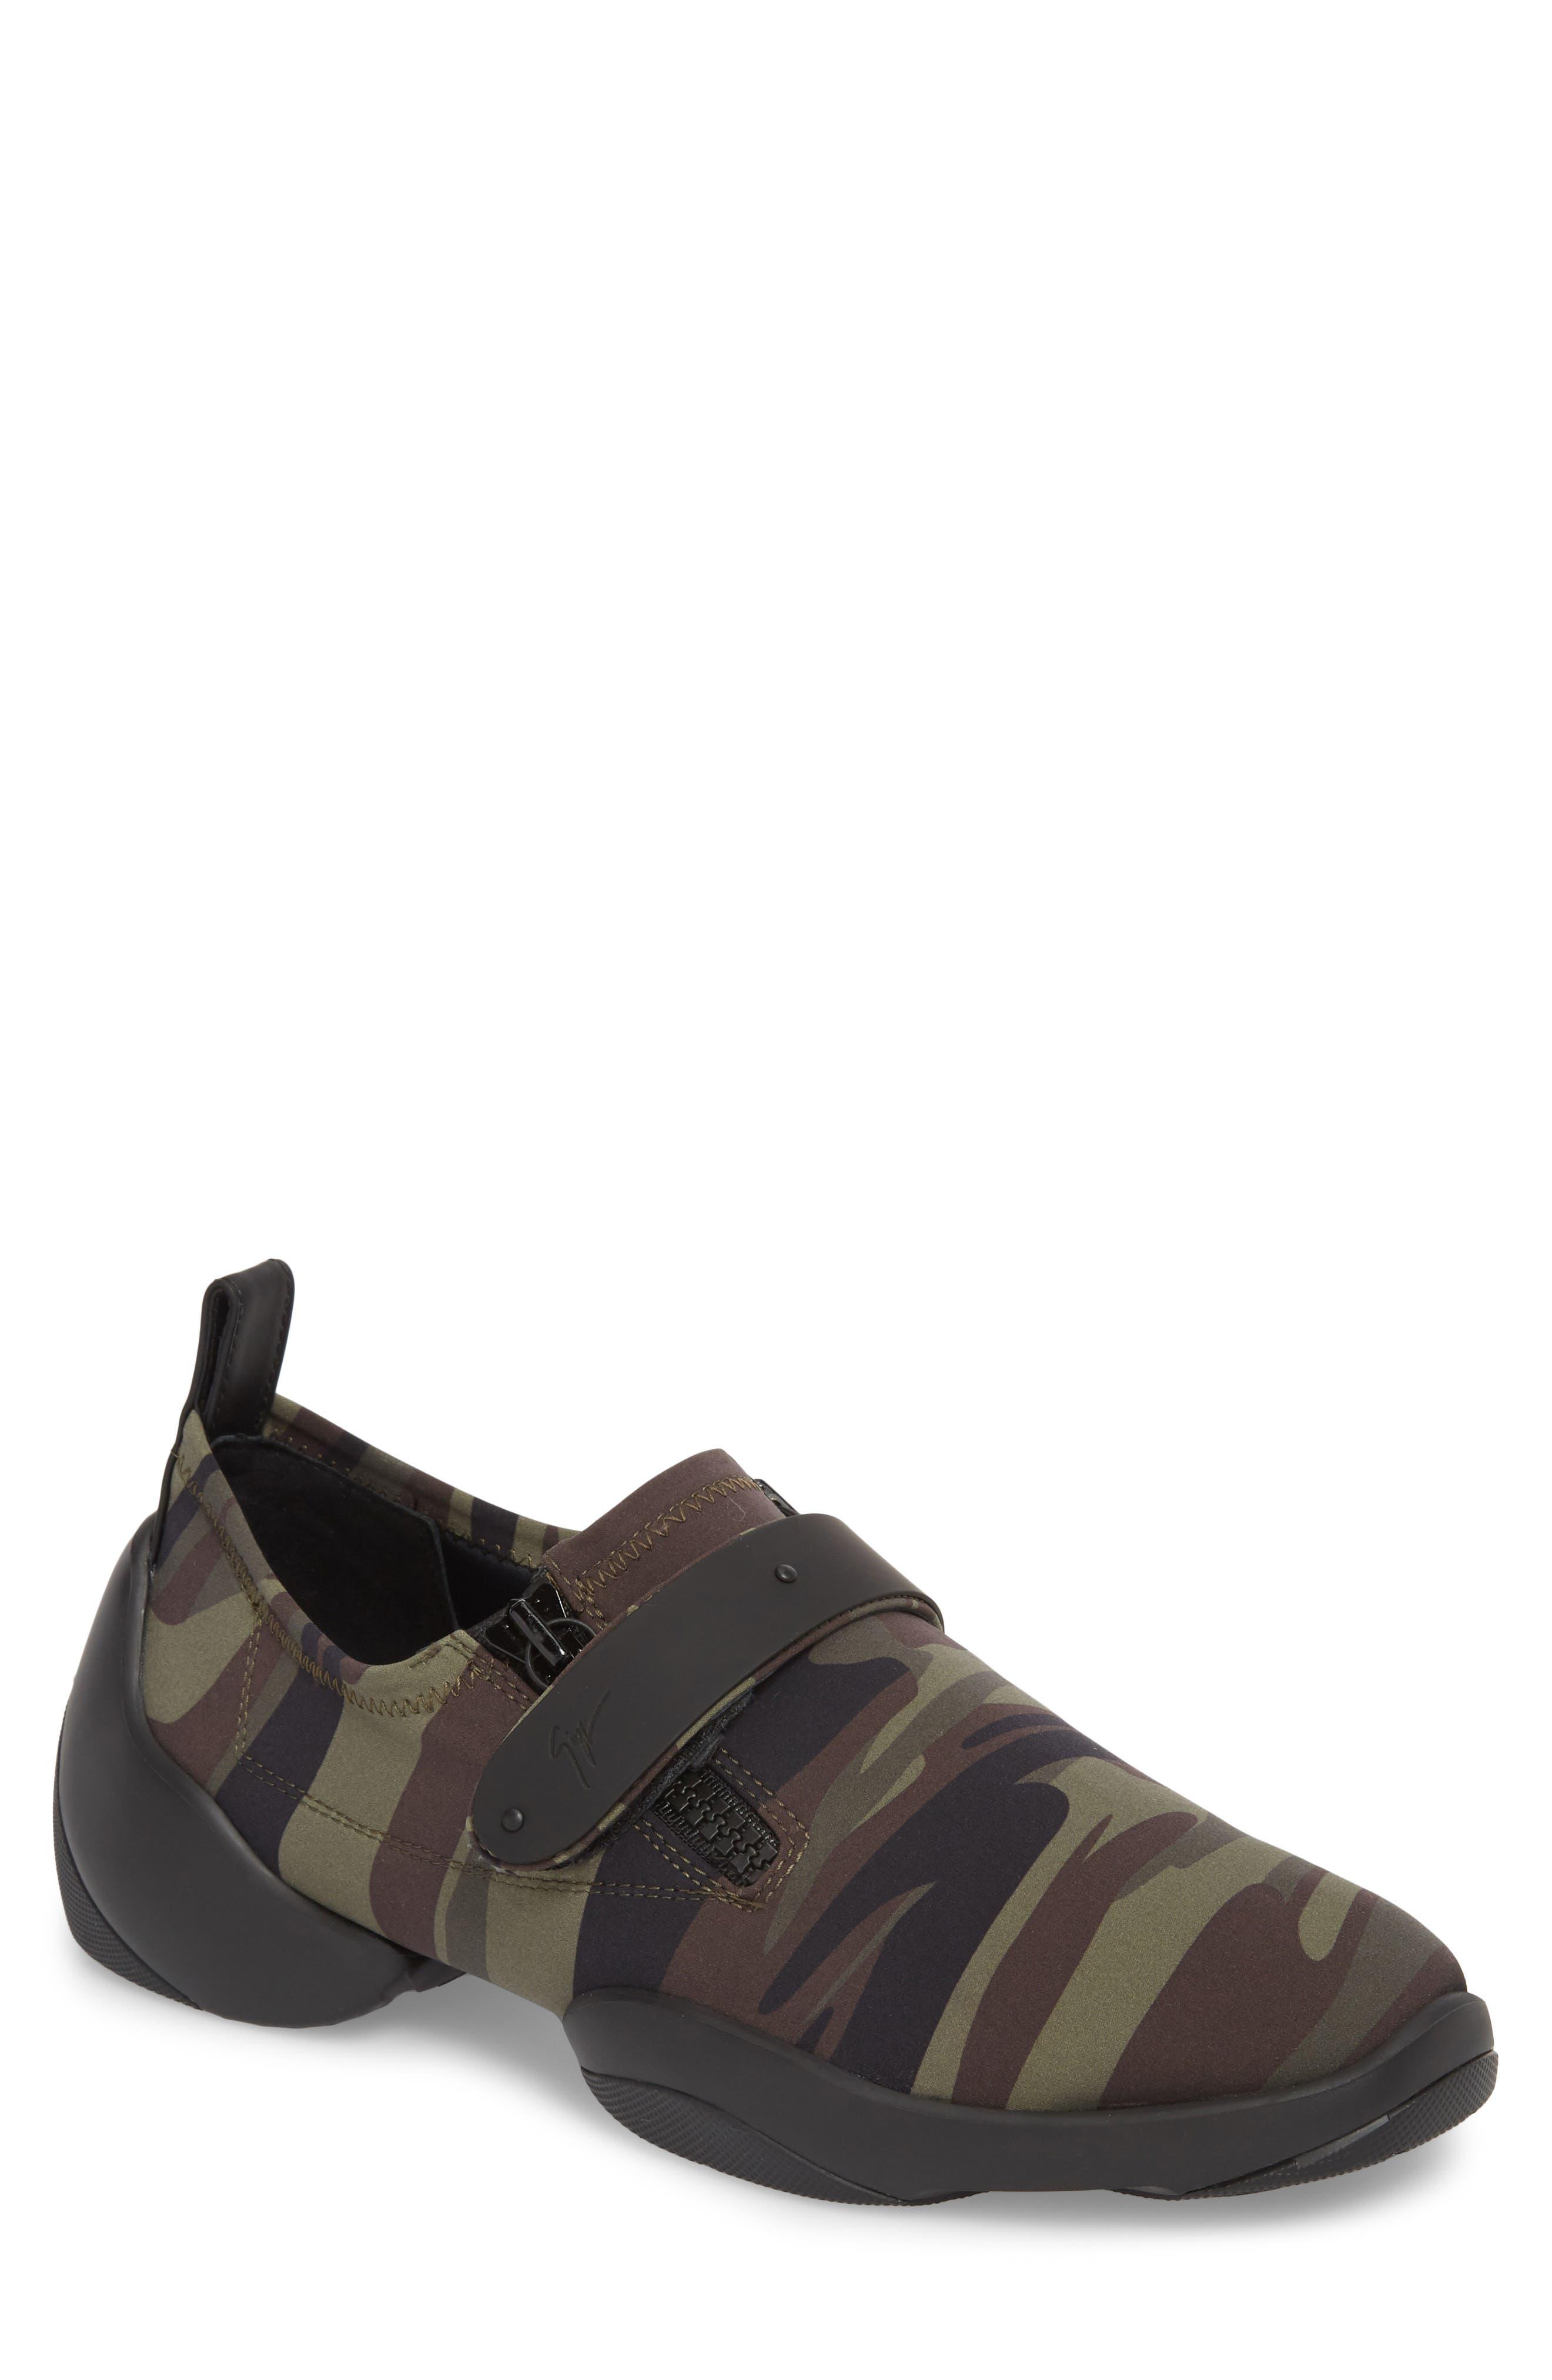 Scuba Strap Sneaker,                         Main,                         color, Military Neoprene